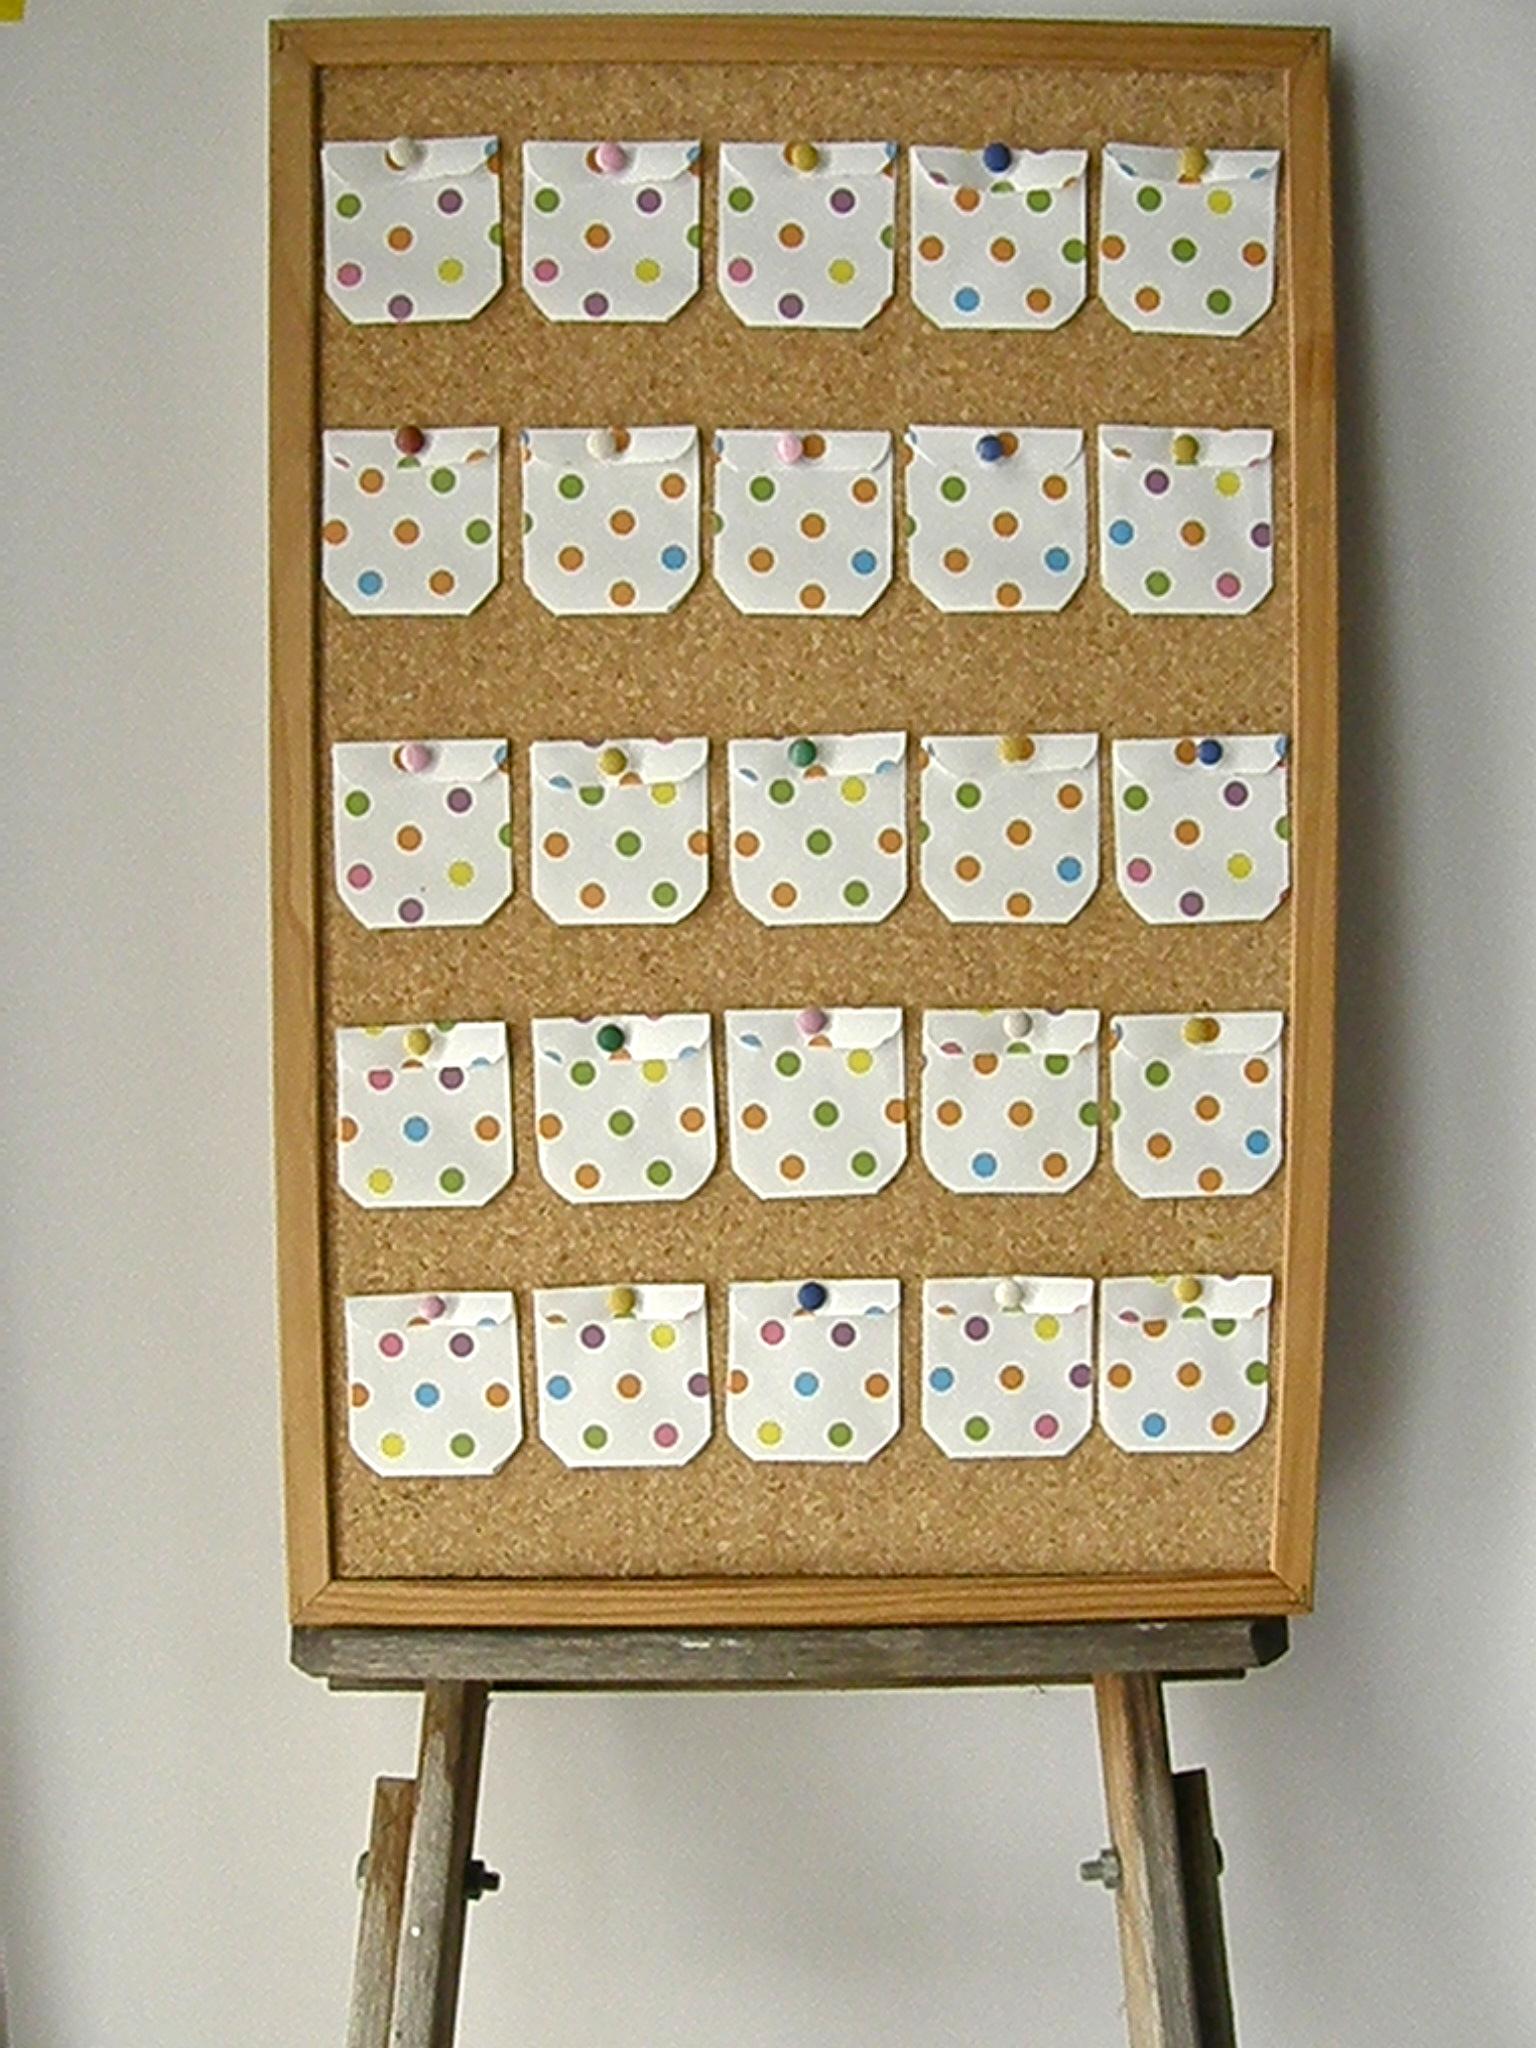 November Calendar Bulletin Board Ideas : Quick make a corkboard advent calendar